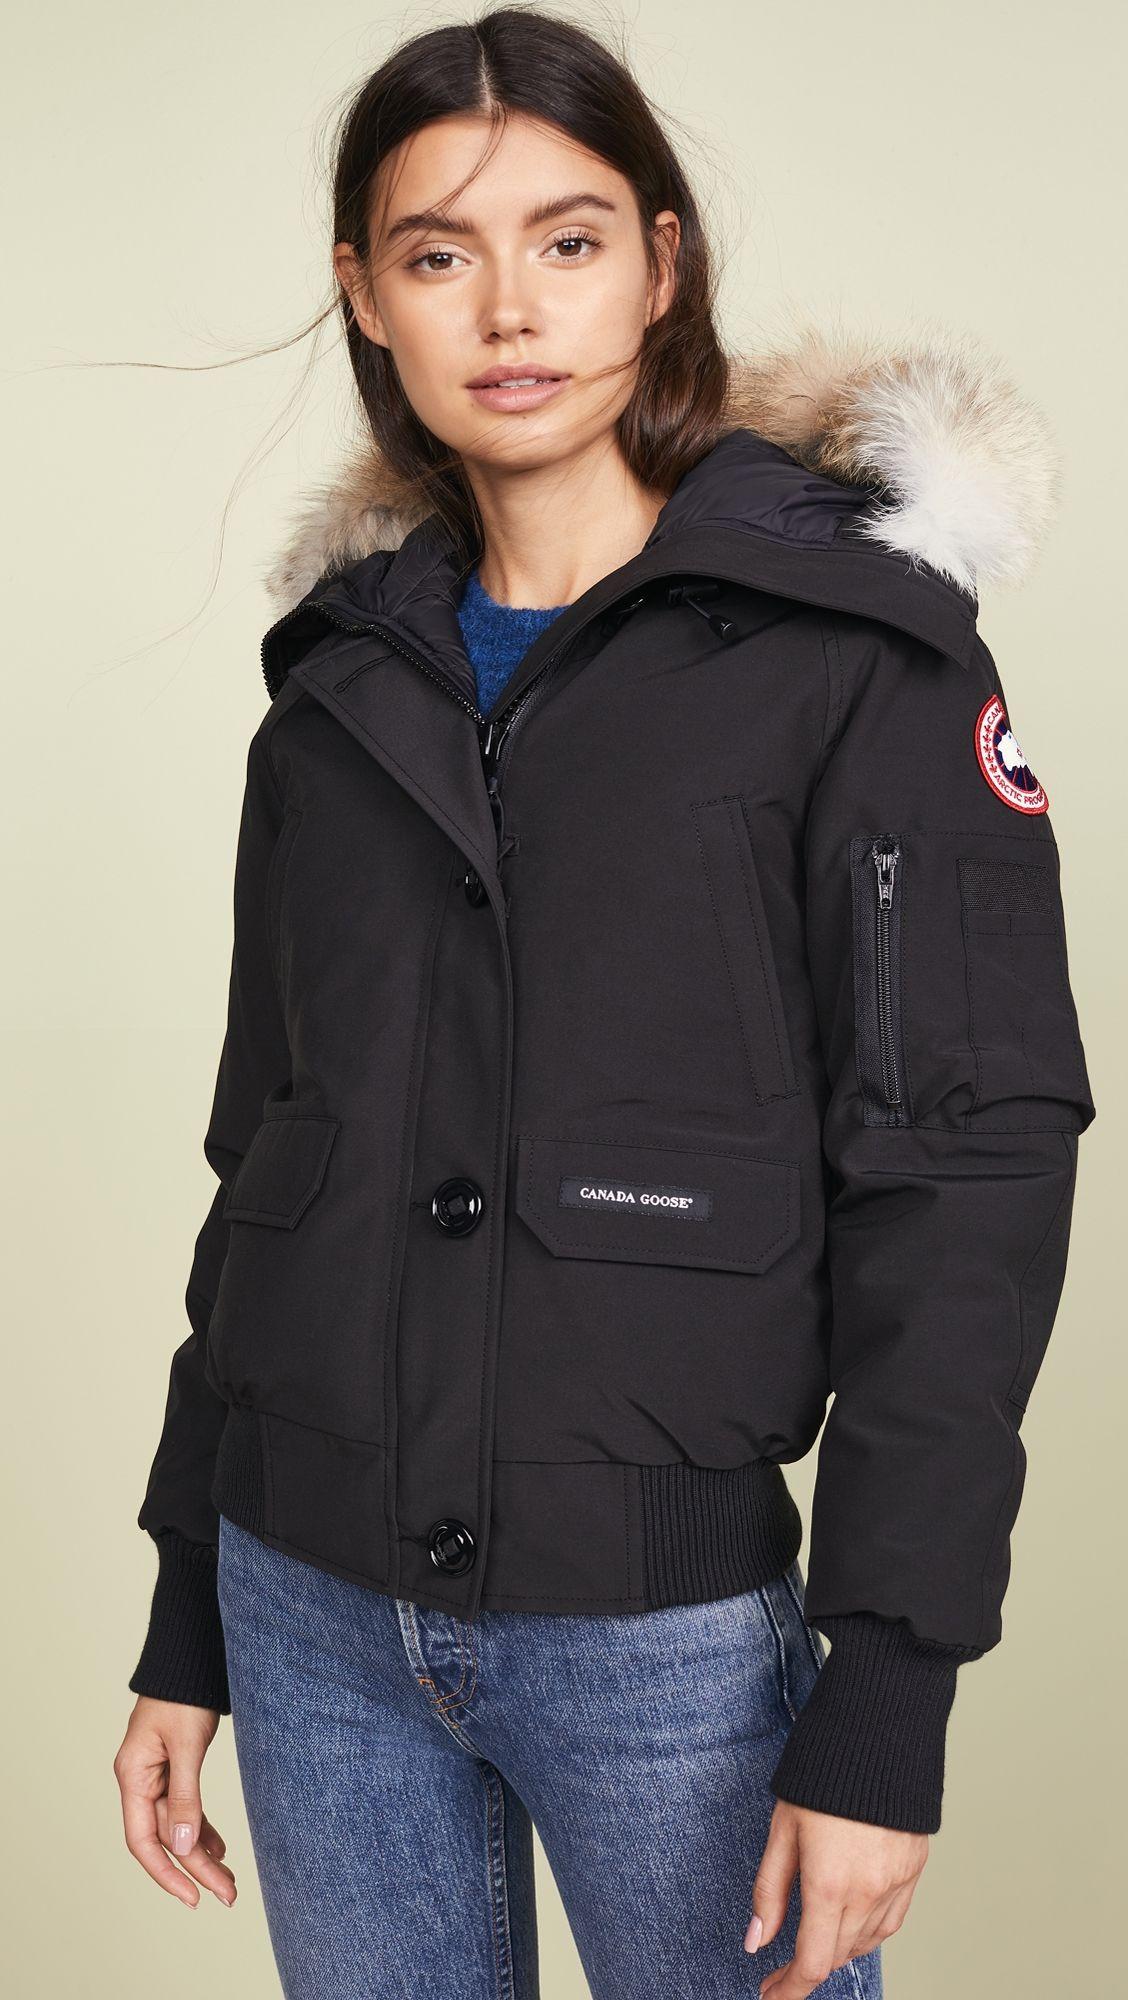 Canada Goose Chilliwack Bomber Canada Goose Women Goose Clothes Clothes For Women